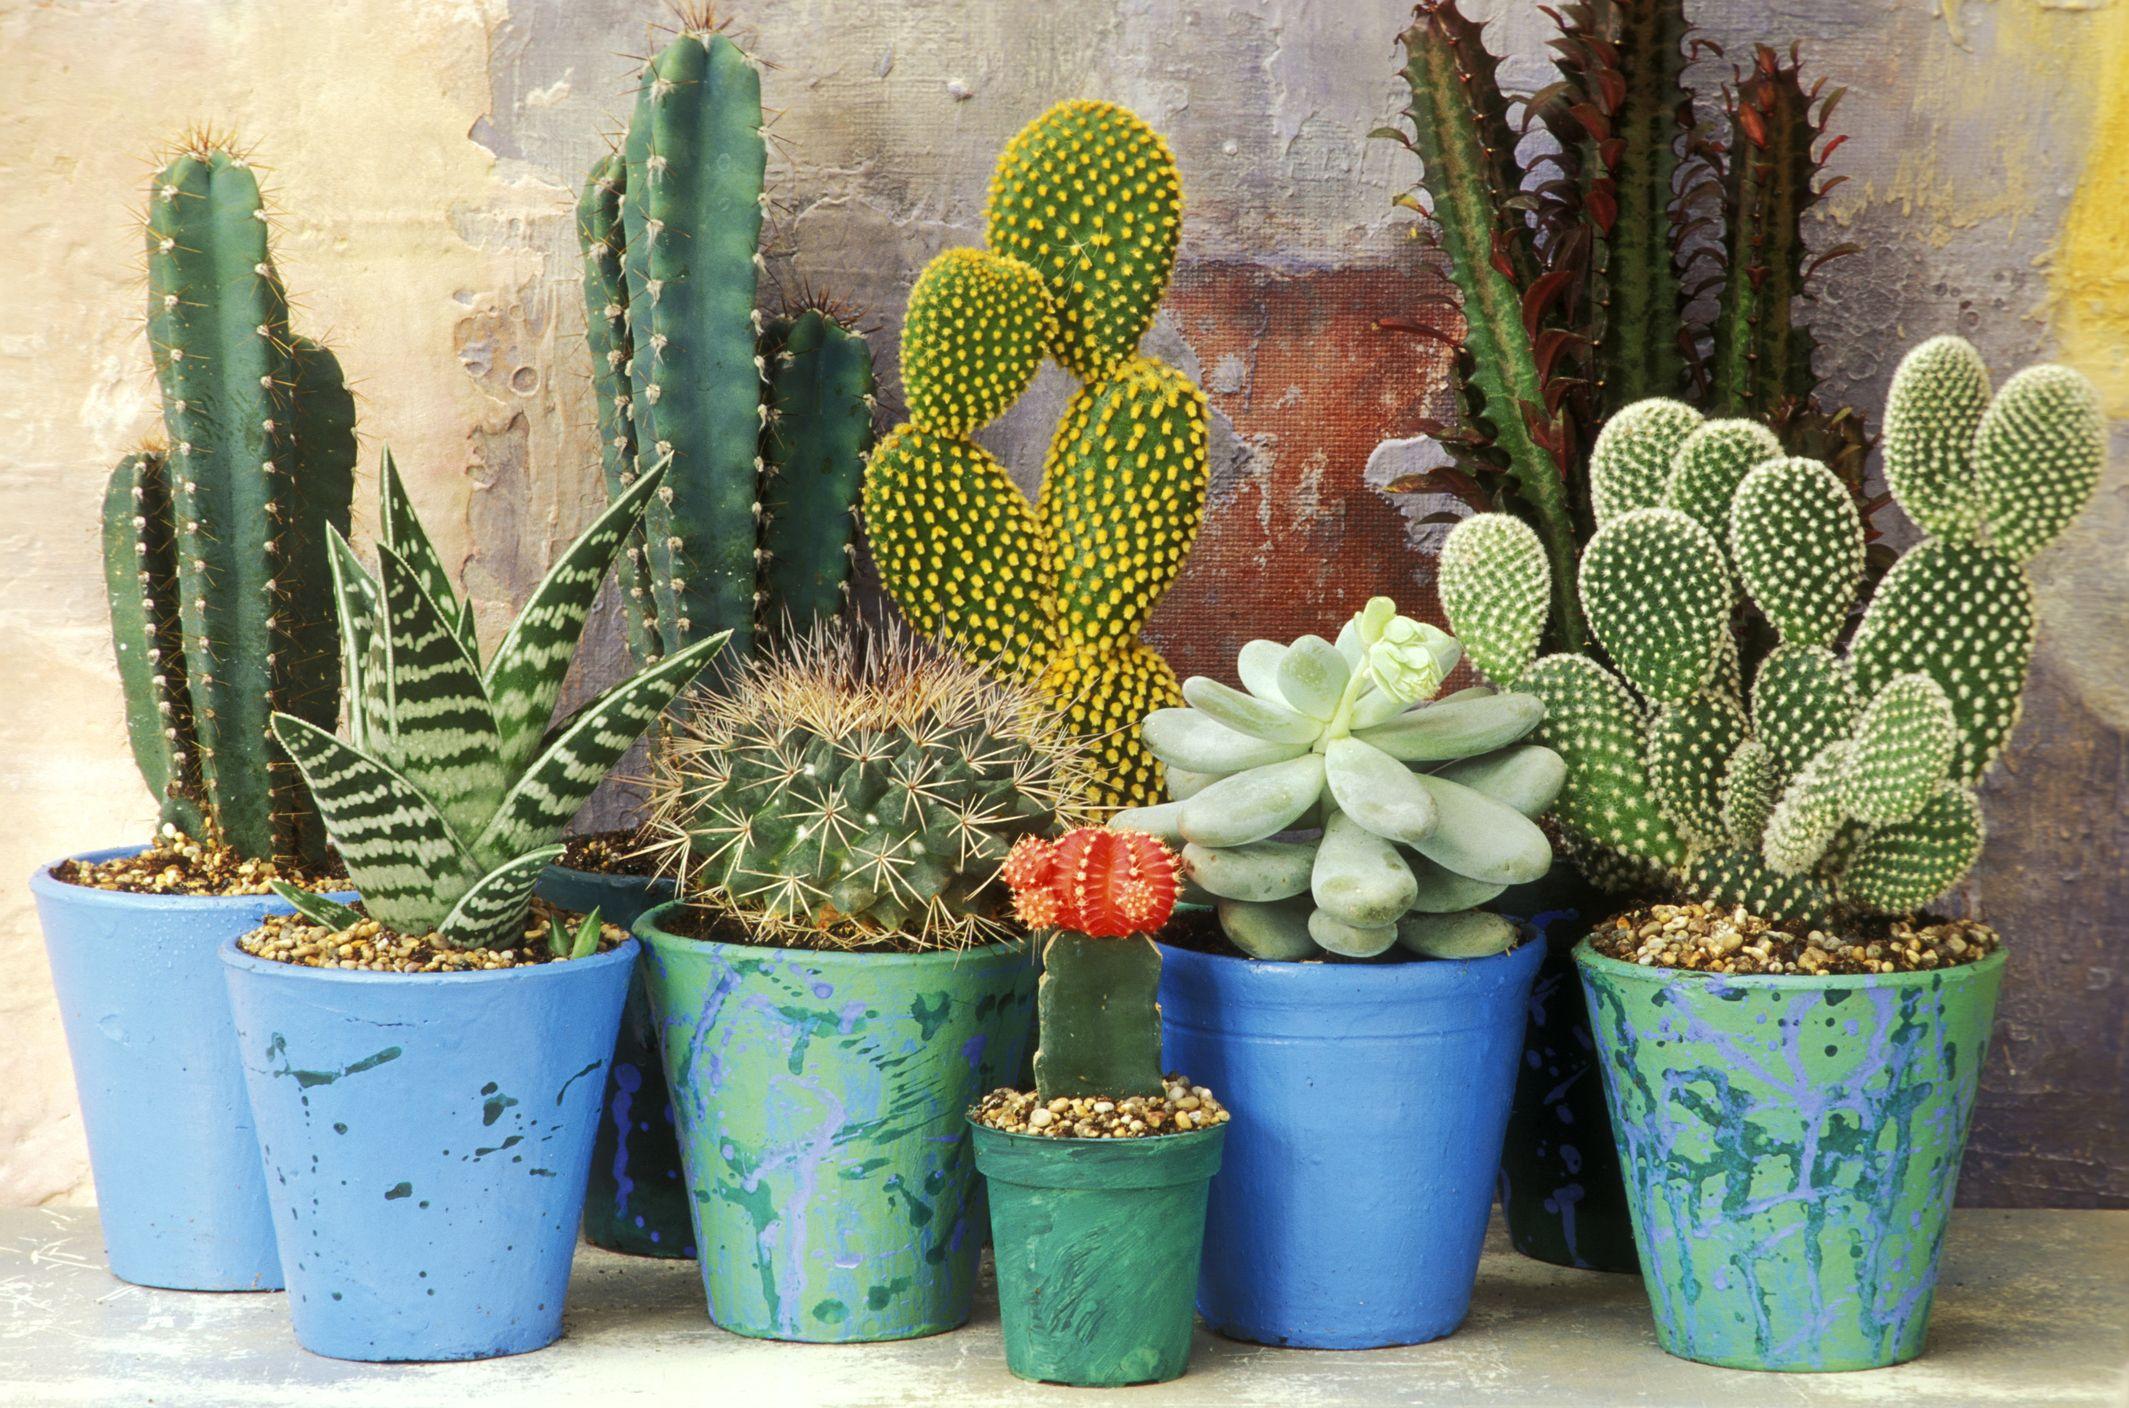 How to grow a cactus